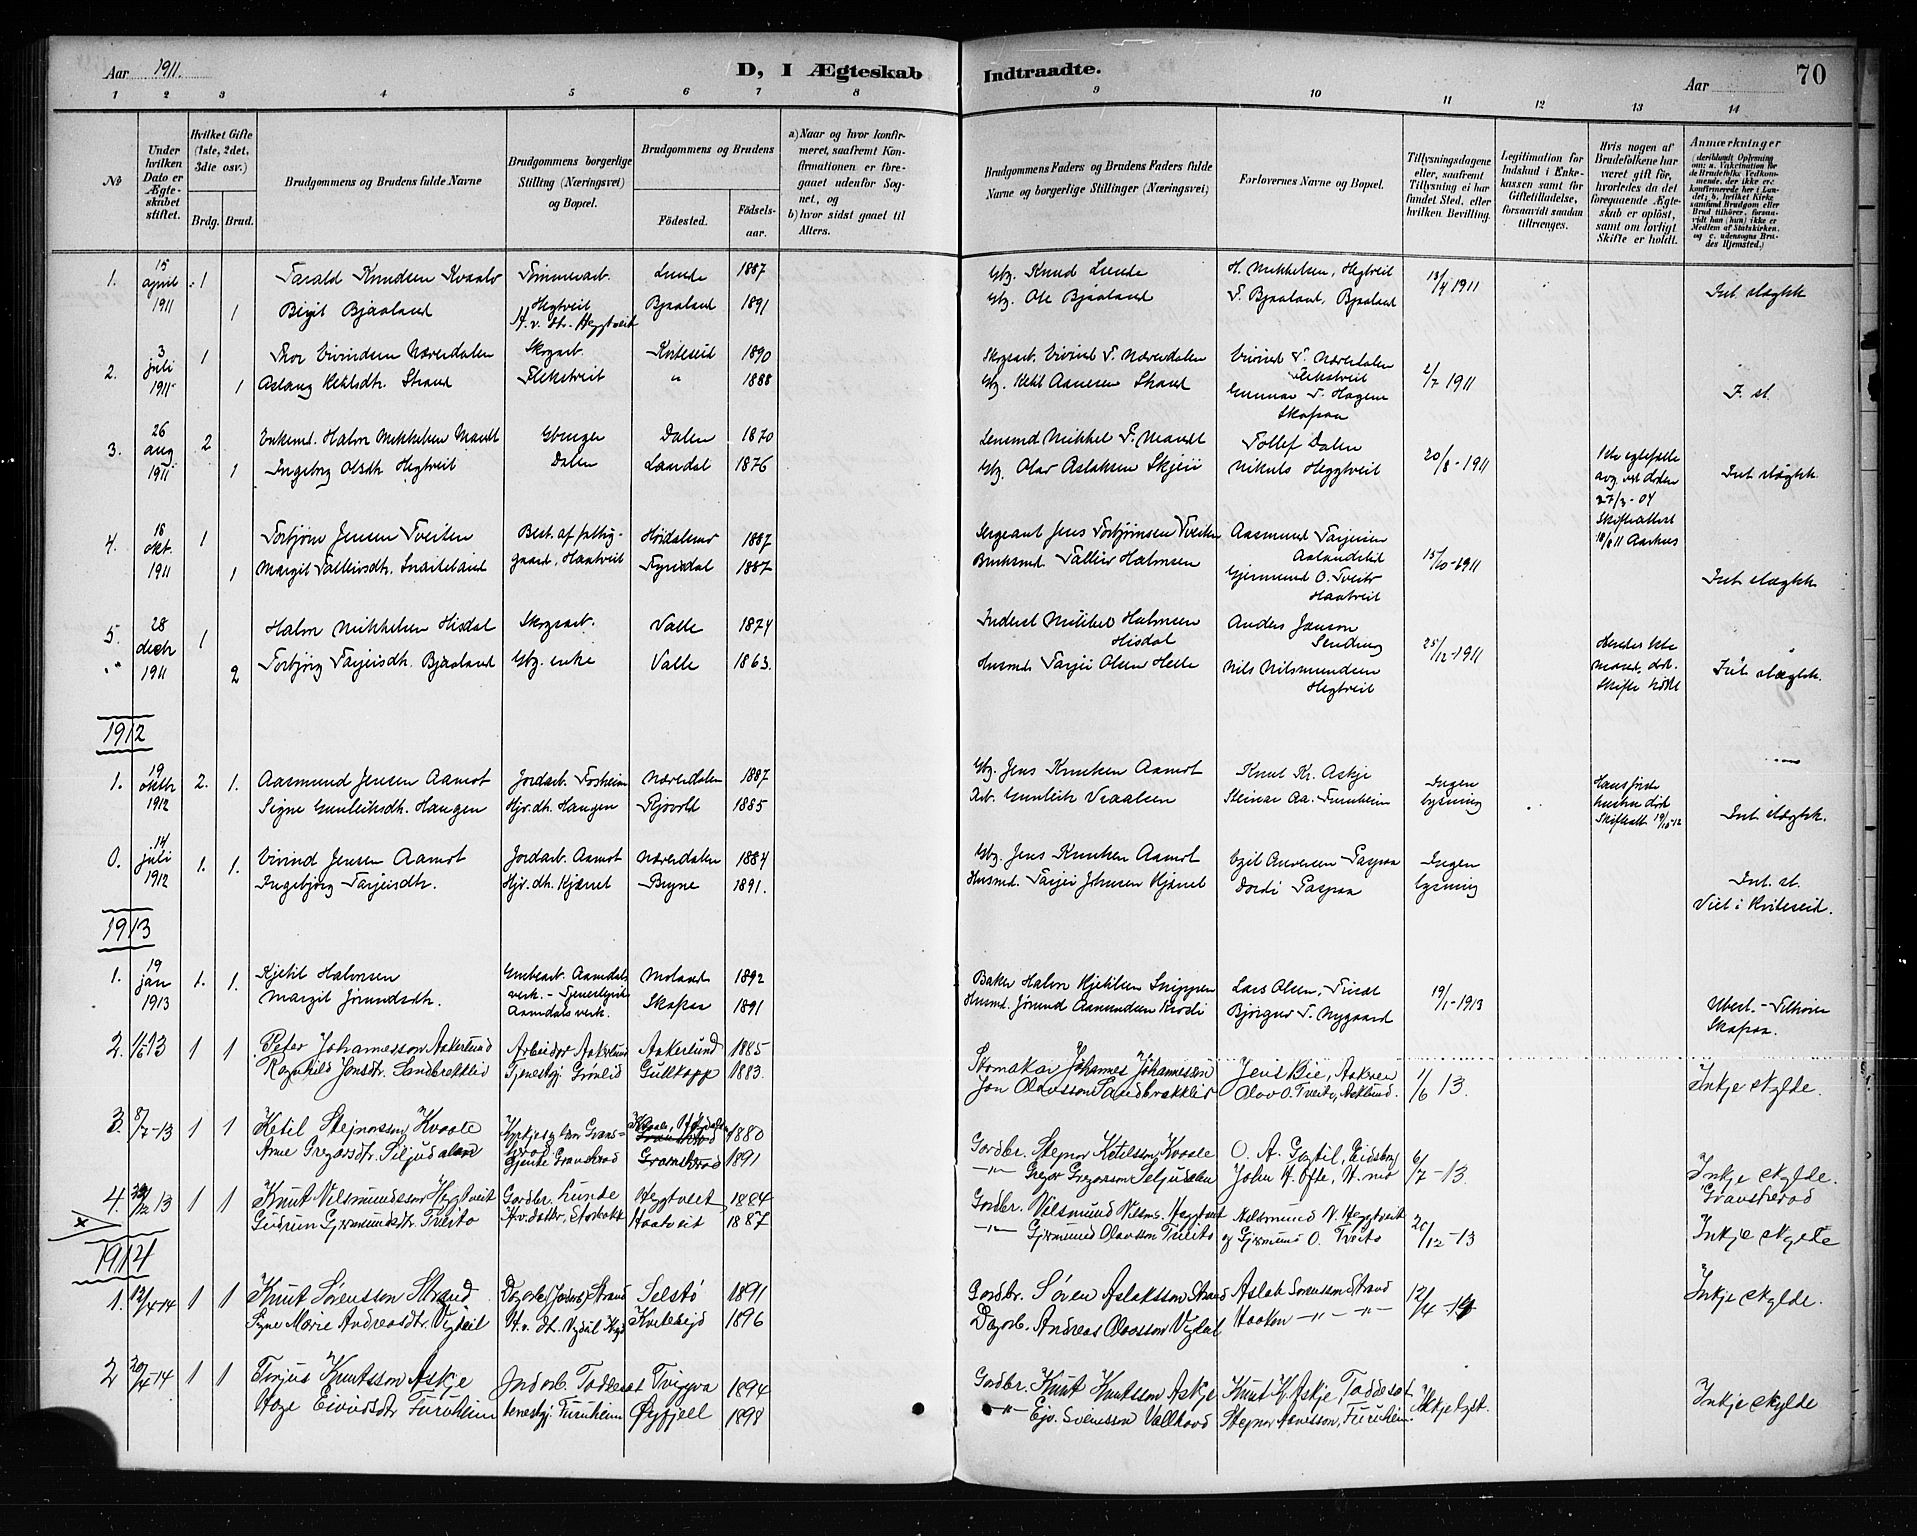 SAKO, Lårdal kirkebøker, G/Ga/L0003: Klokkerbok nr. I 3, 1891-1918, s. 70